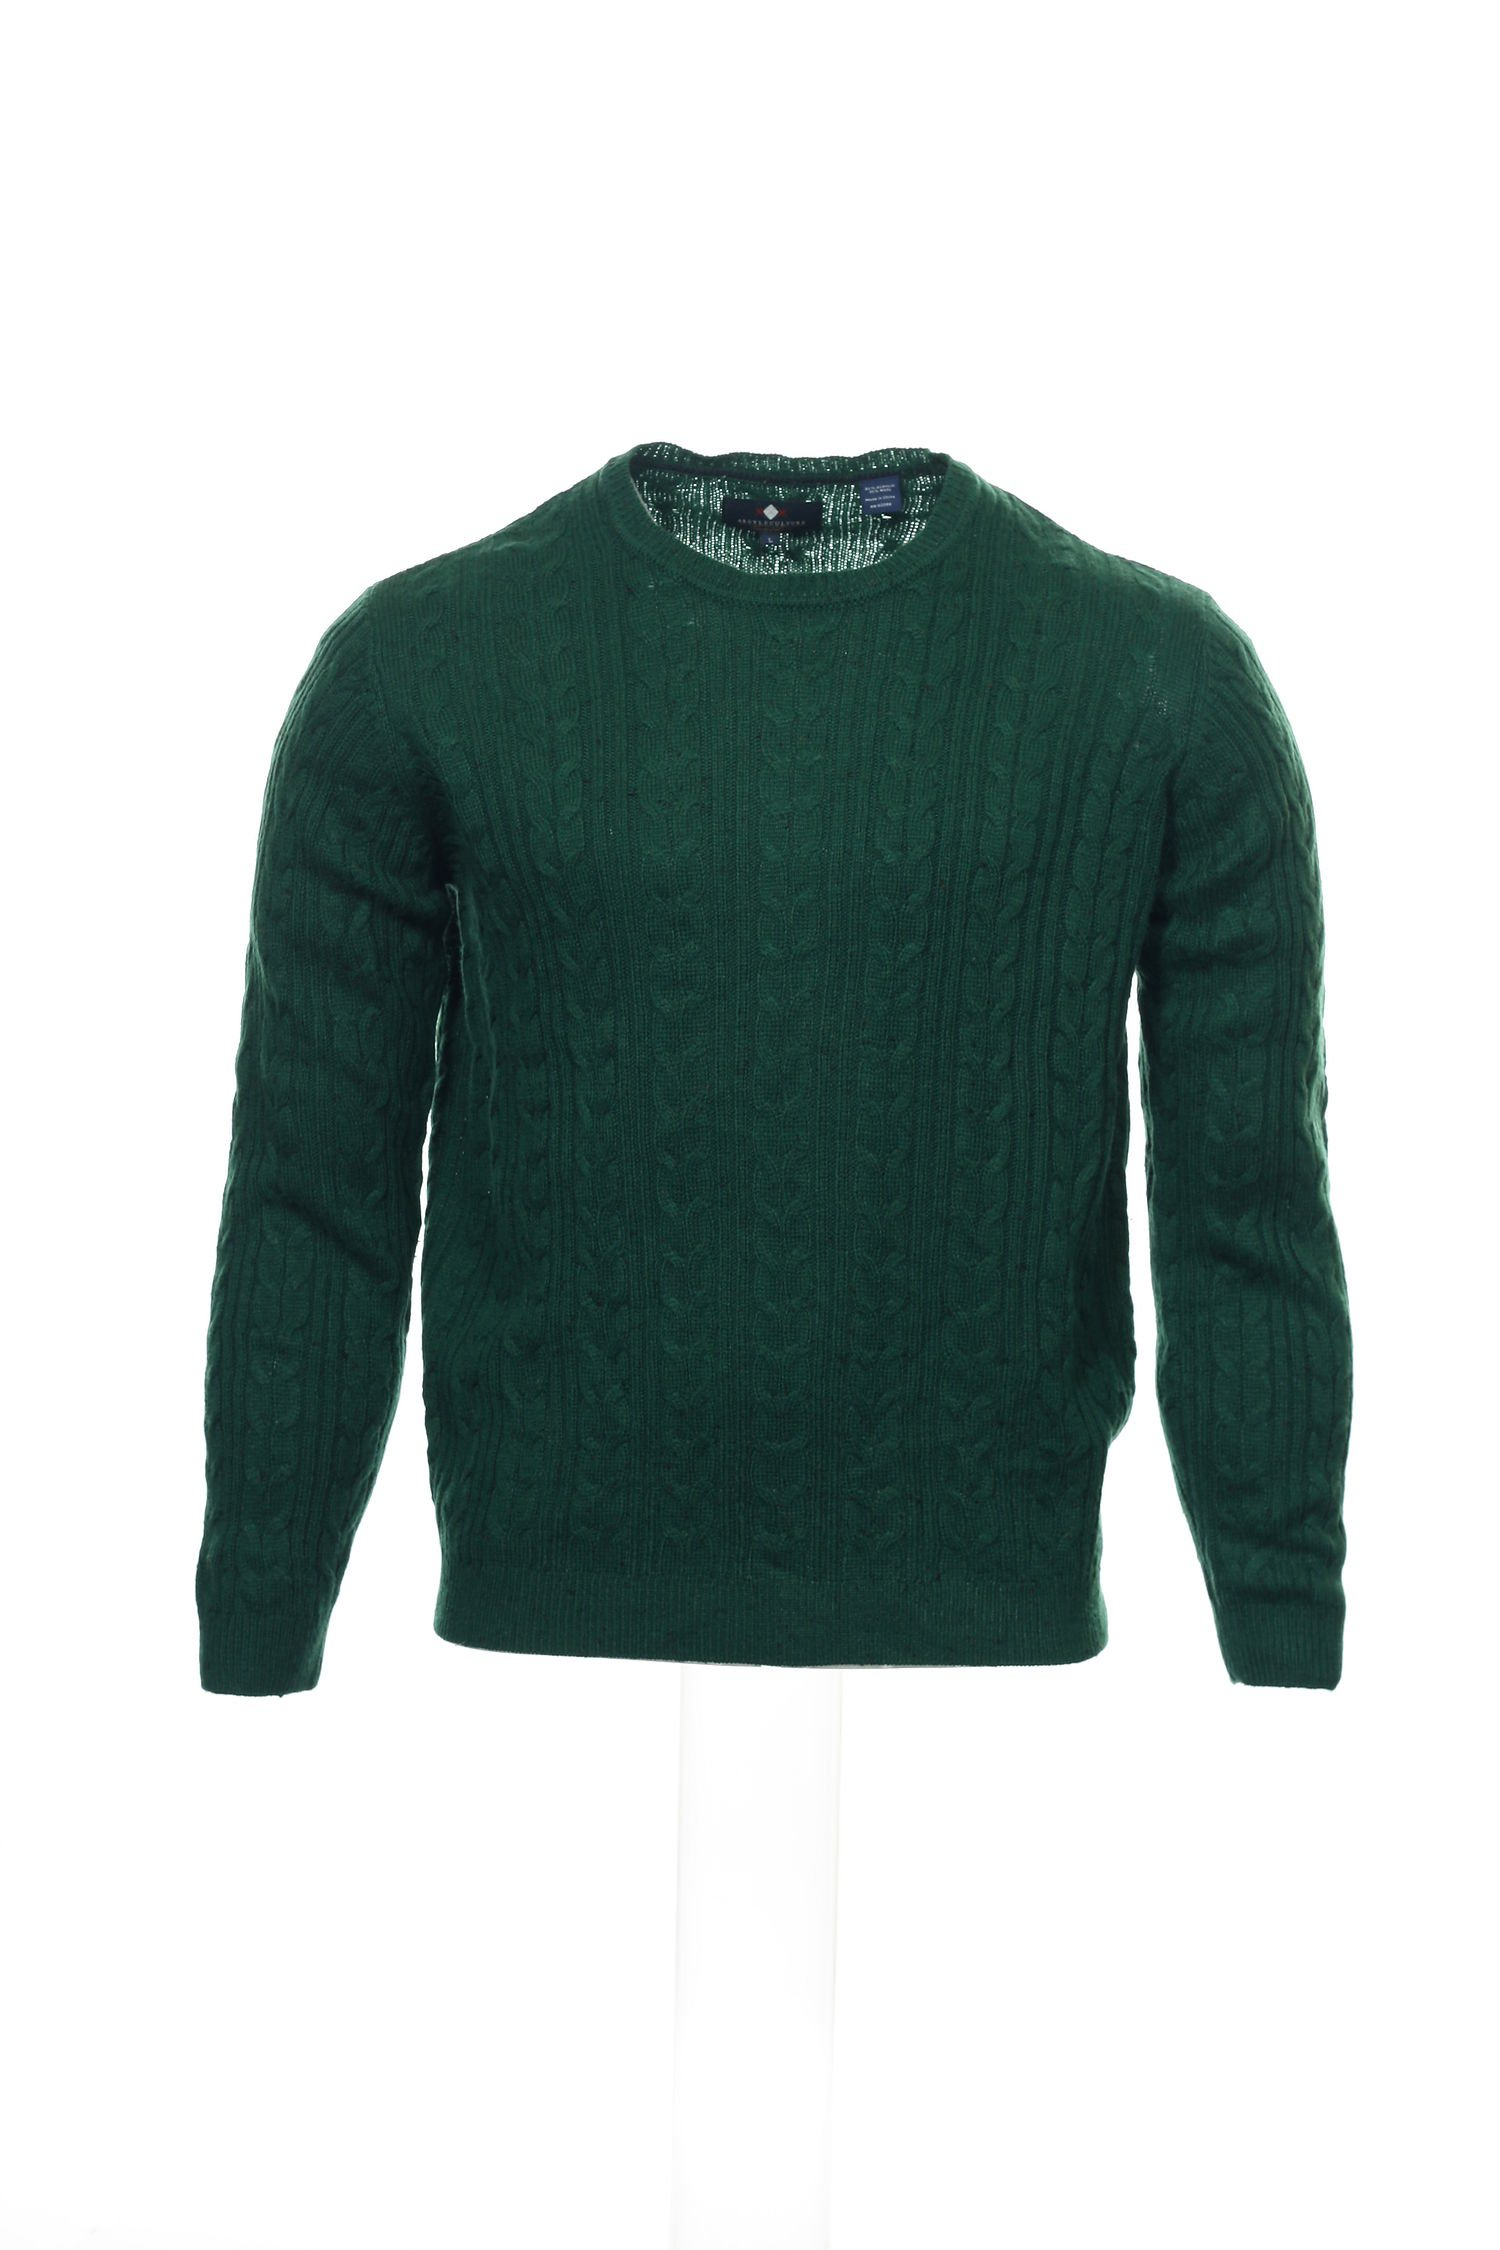 Argyle Culture Pine Green Sweater Medium